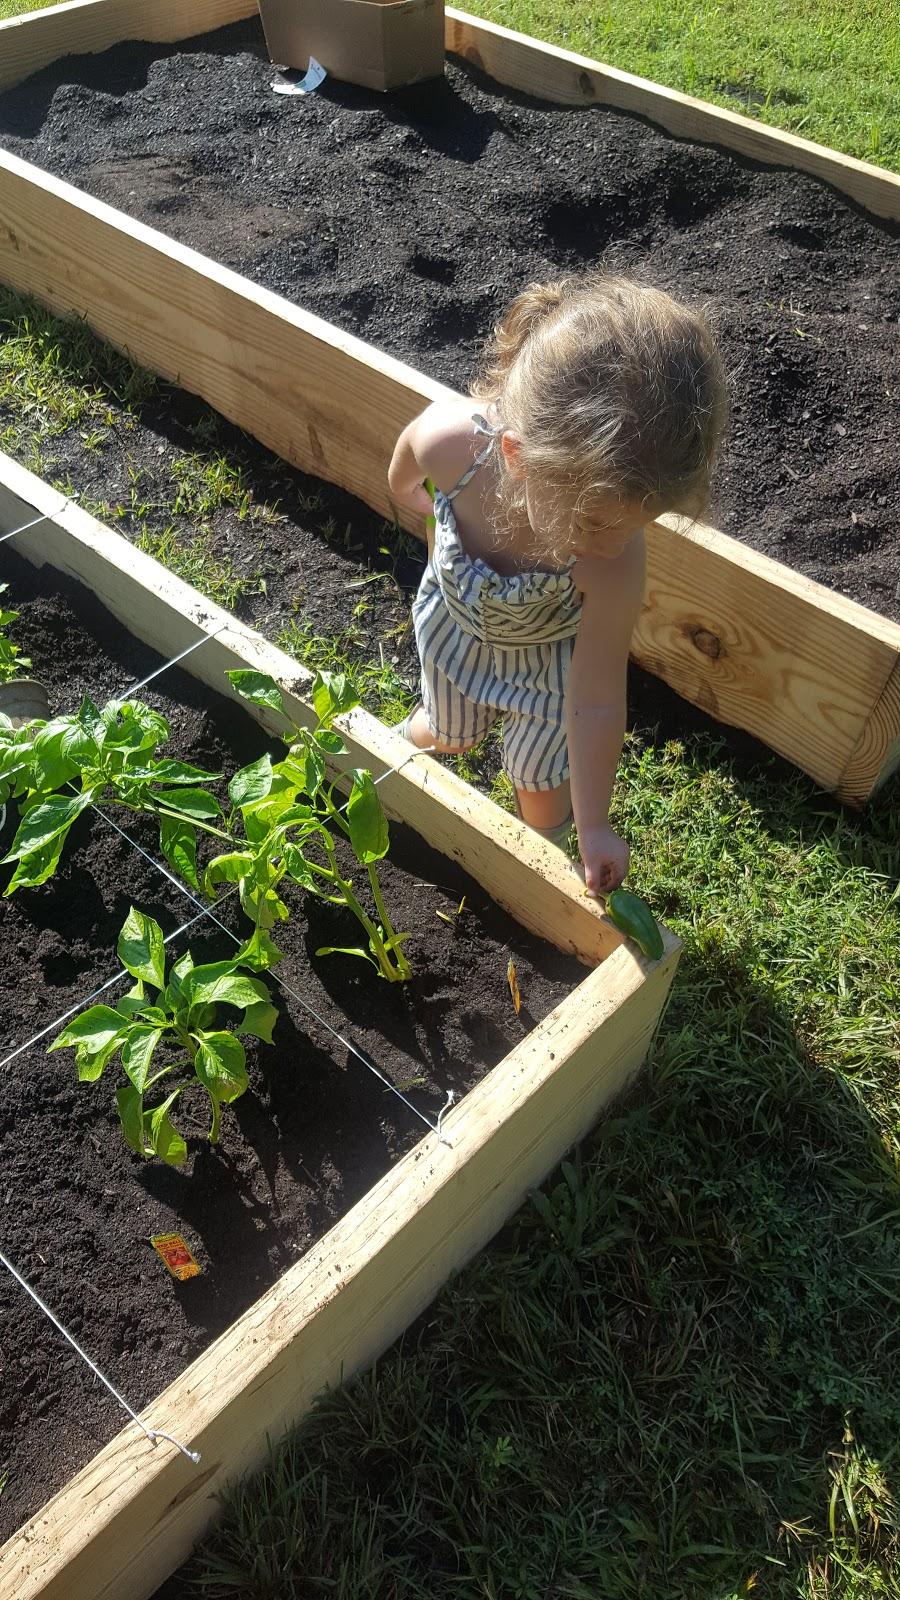 Wildflower Preschool & Kindergarten - school  | Photo 7 of 10 | Address: 3100 Damascus Church Rd, Chapel Hill, NC 27516, USA | Phone: (919) 260-6859